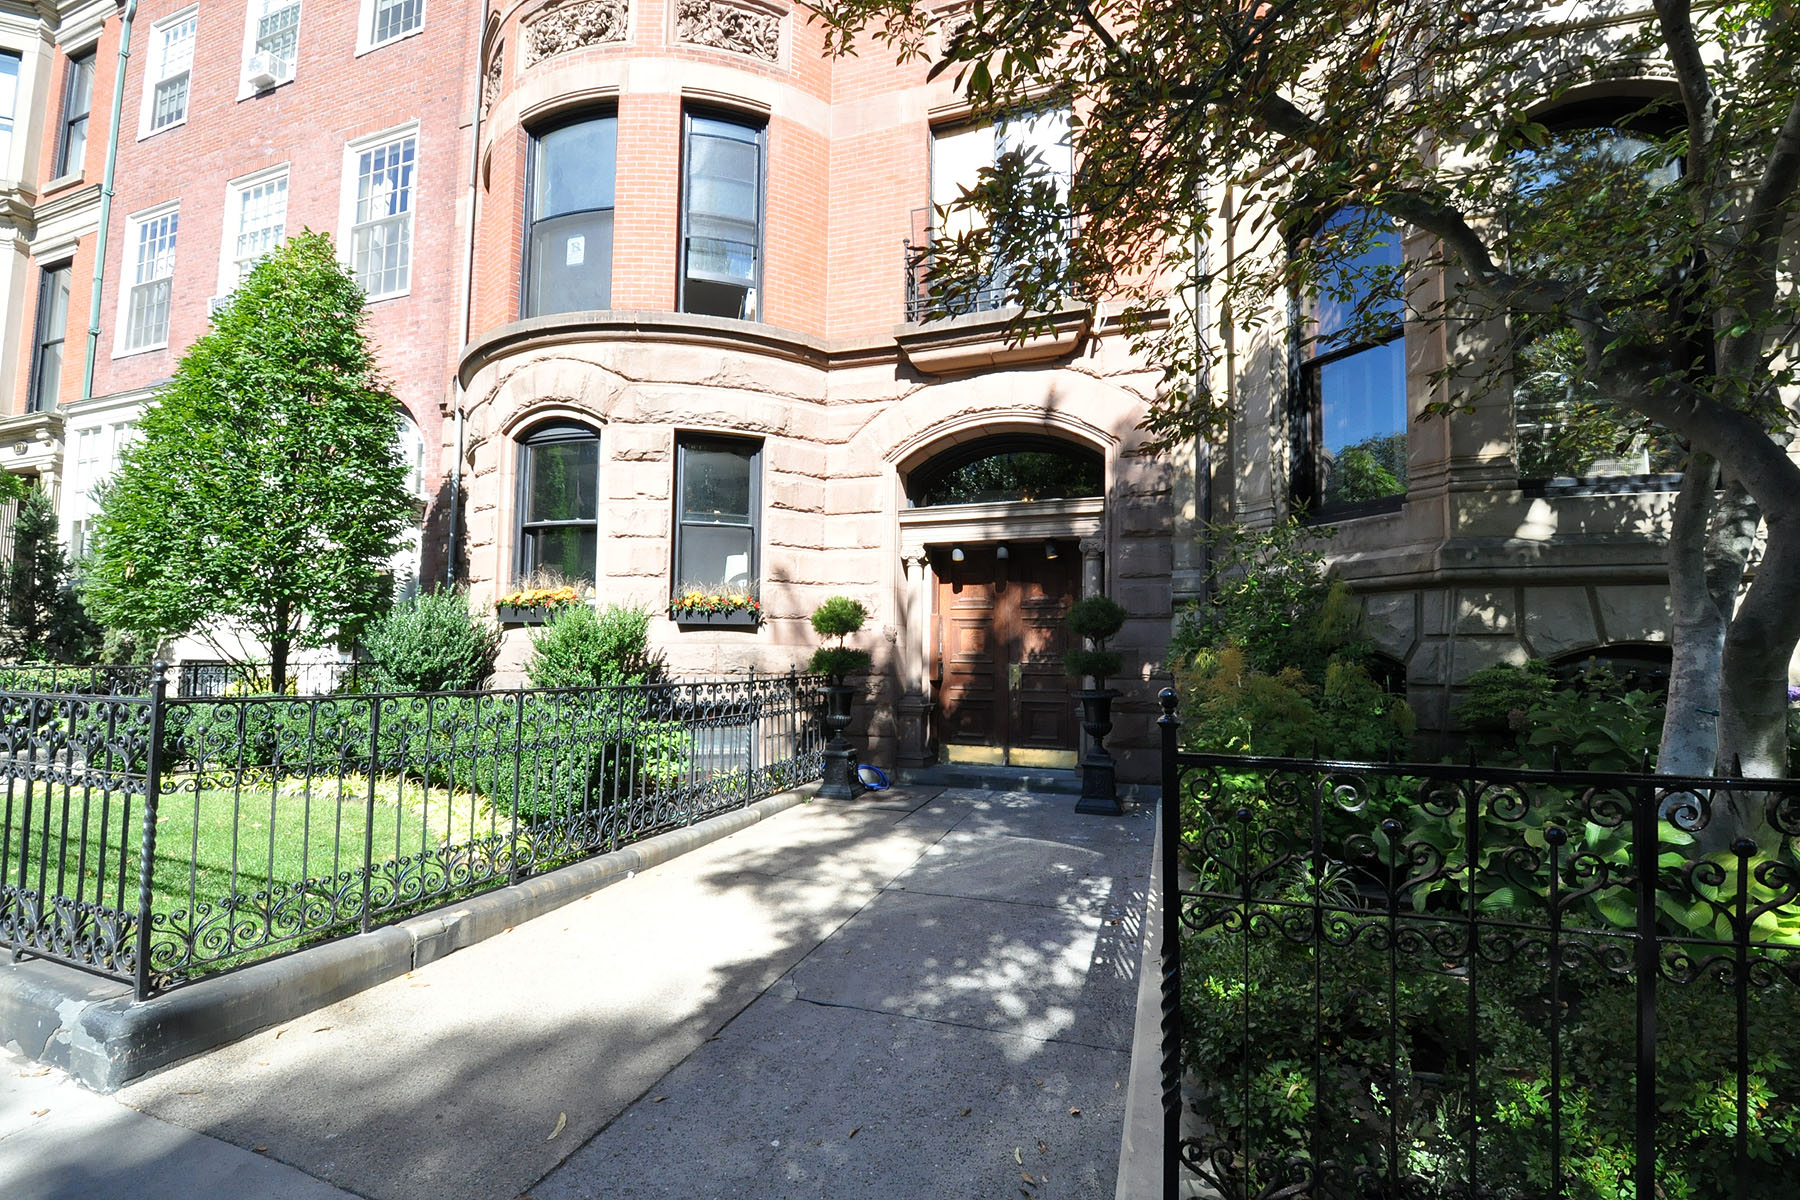 Condominium for Sale at Rare Opportunity 167 Commonwealth Ave Unit 1 Back Bay, Boston, Massachusetts 02116 United States